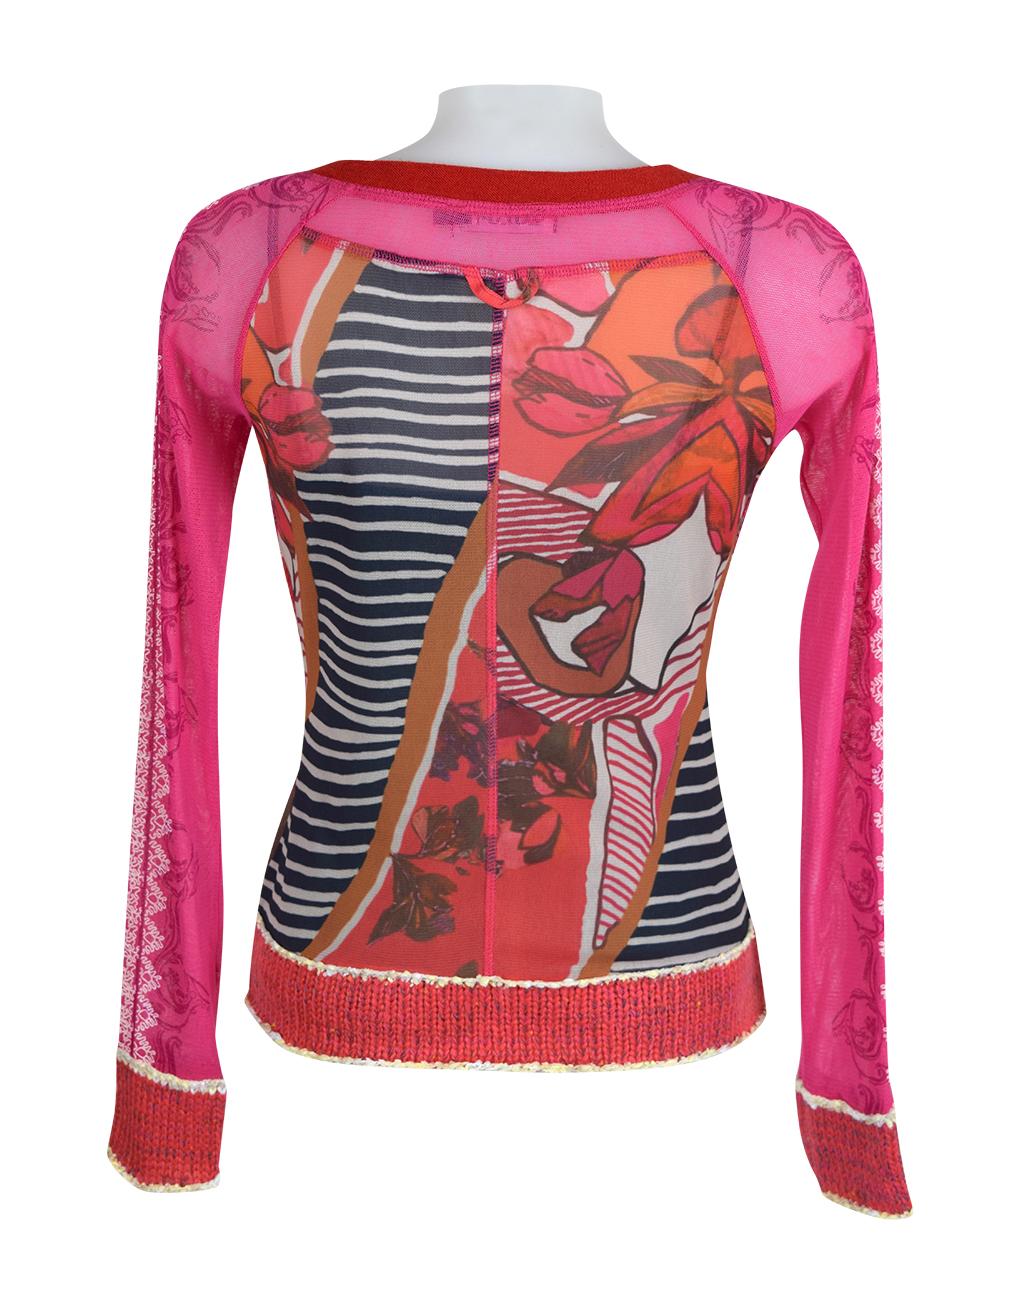 Lulu H Pink Zipped Top2